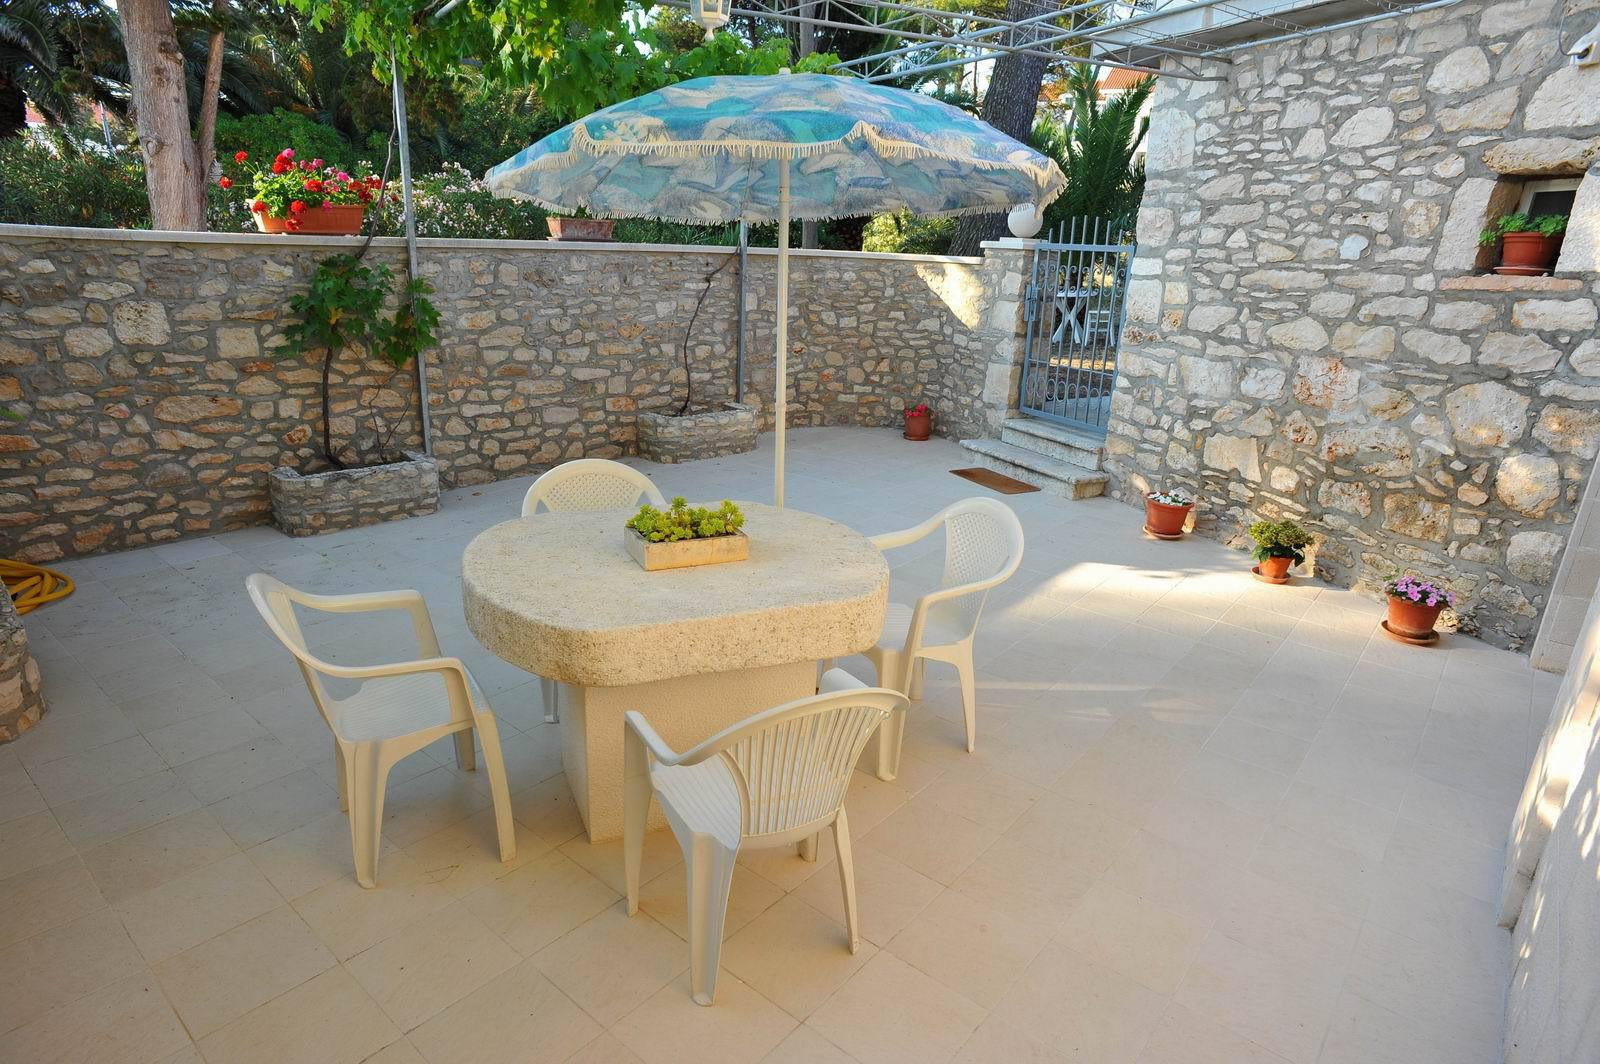 01501SUTI - Sutivan - Appartements Croatie - SA4(2+1): terrasse de jardin